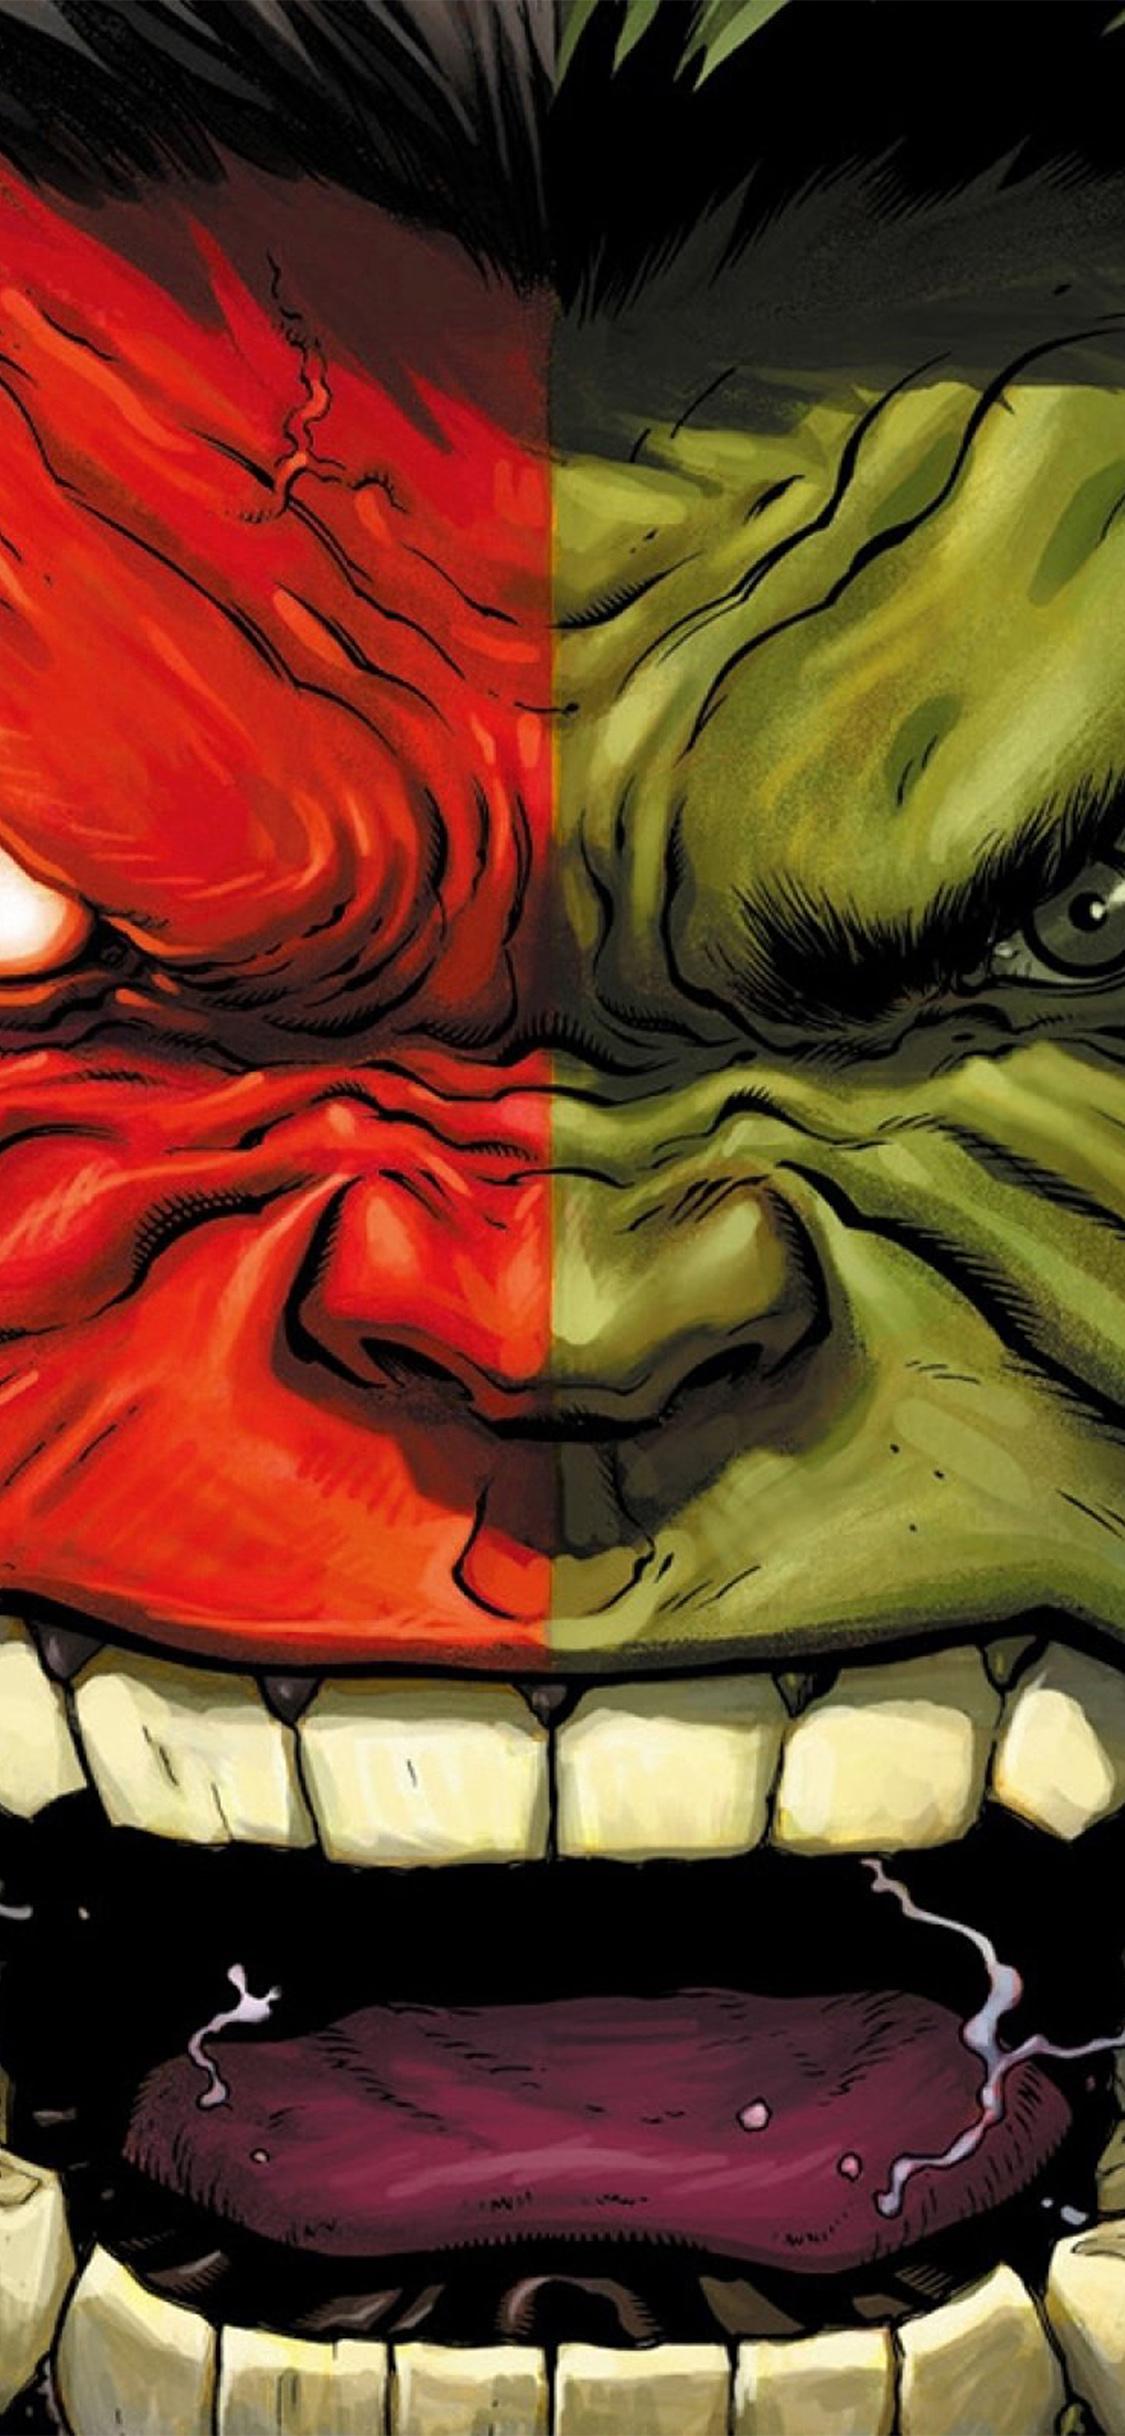 Abstract Iphone 5 Wallpaper Hd Au36 Hulk Red Anger Cartoon Illustration Art Wallpaper